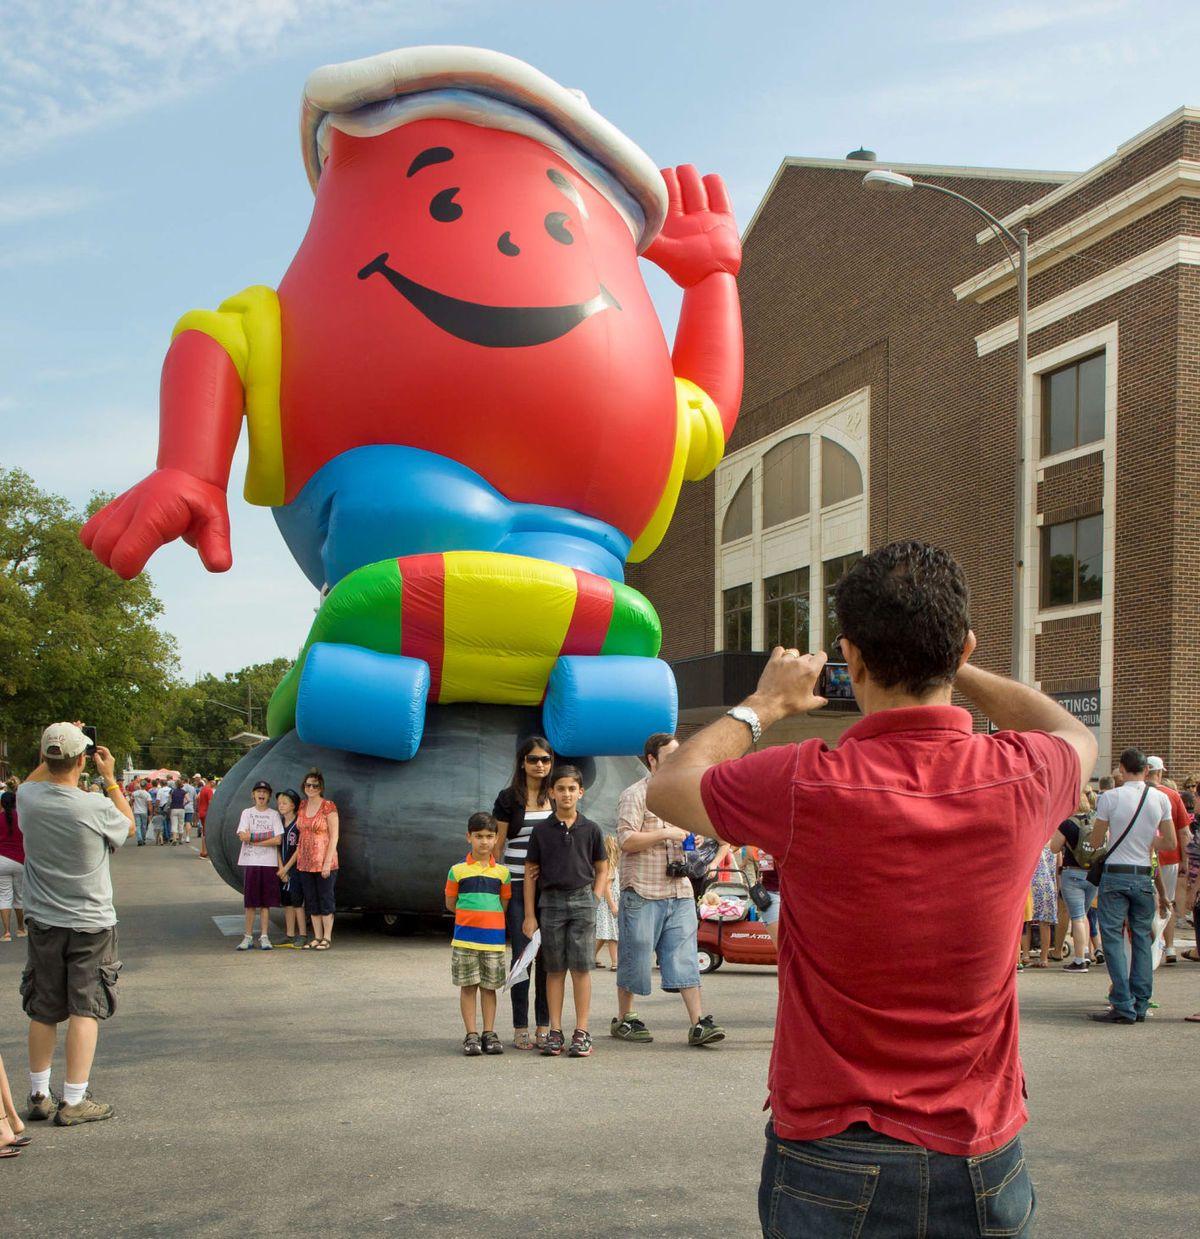 Kool Aid Days Nebraska Balloon Wine Festival And 40 Other Fun Things To Do This Weekend Travel Nebraska Event Calendar Visitors Bureau